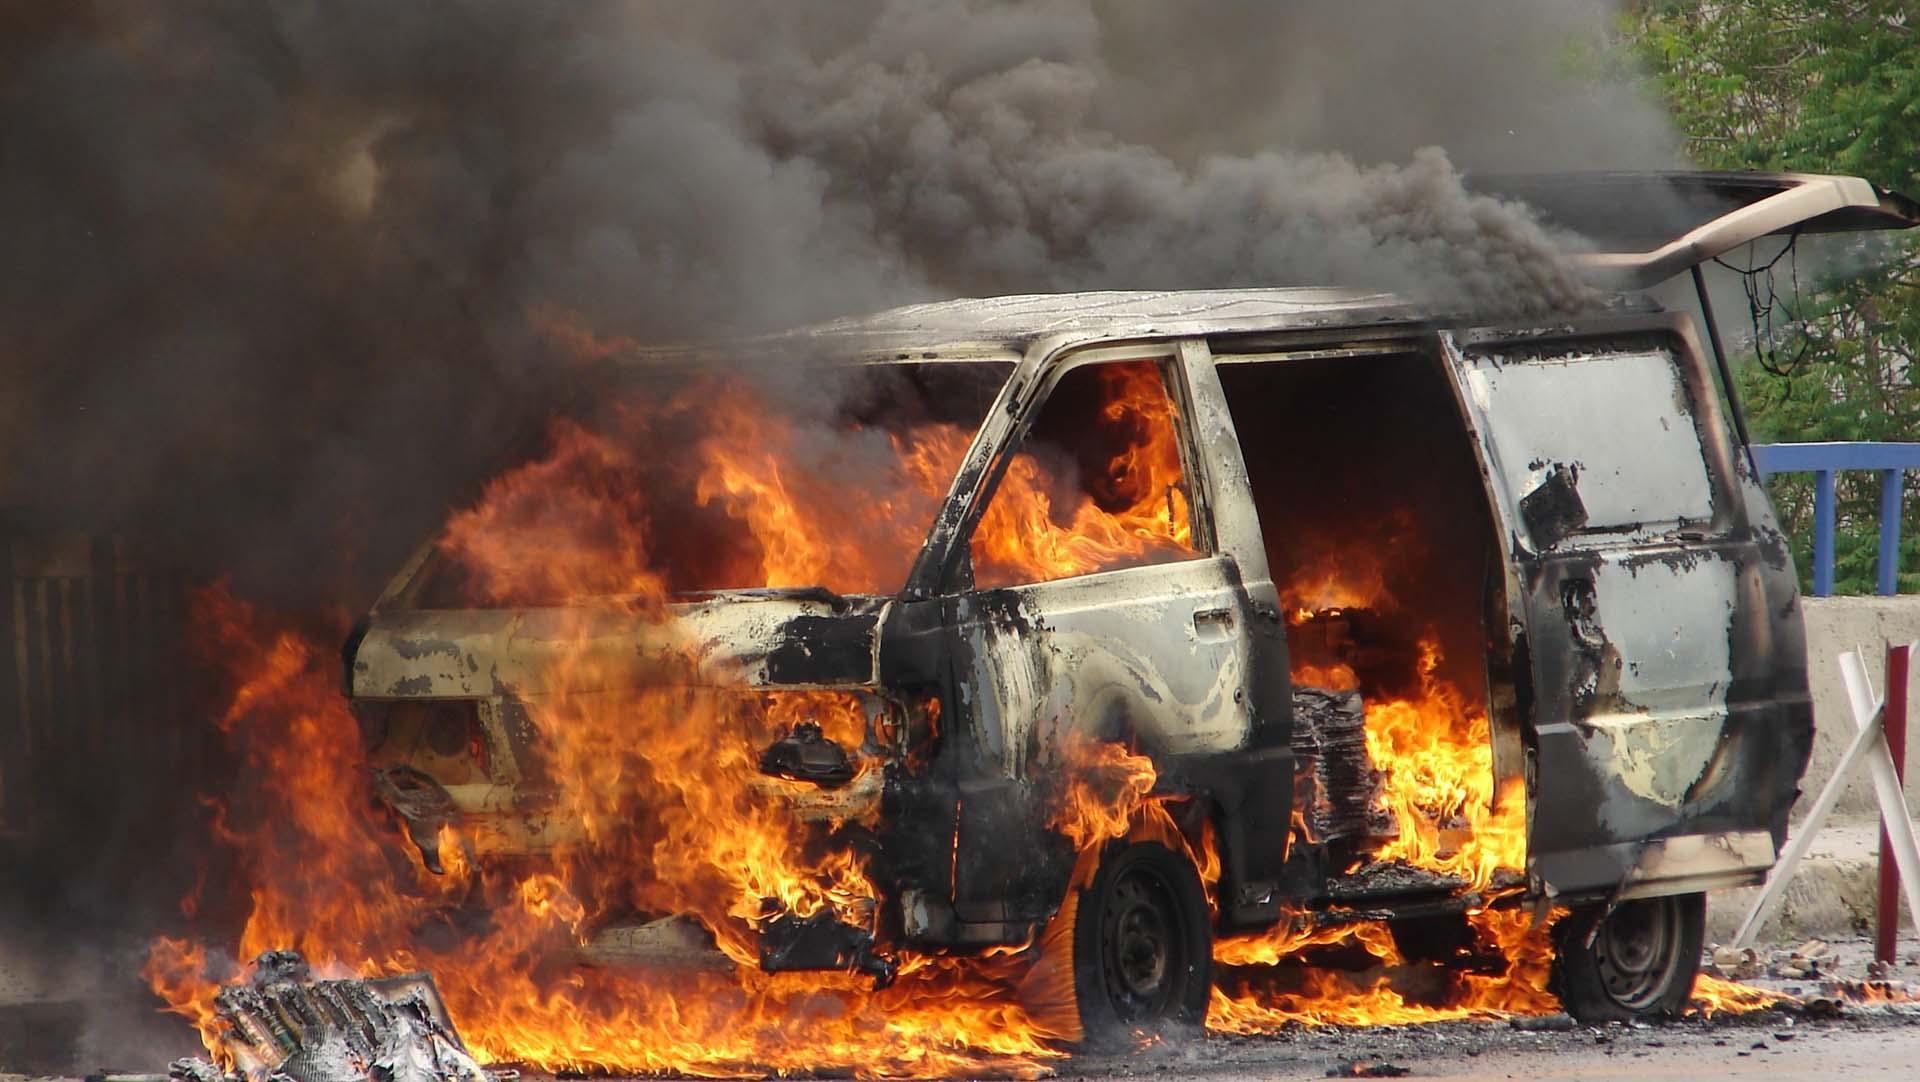 Un vehículo cargado con explosivos explotó frente a un club para policías